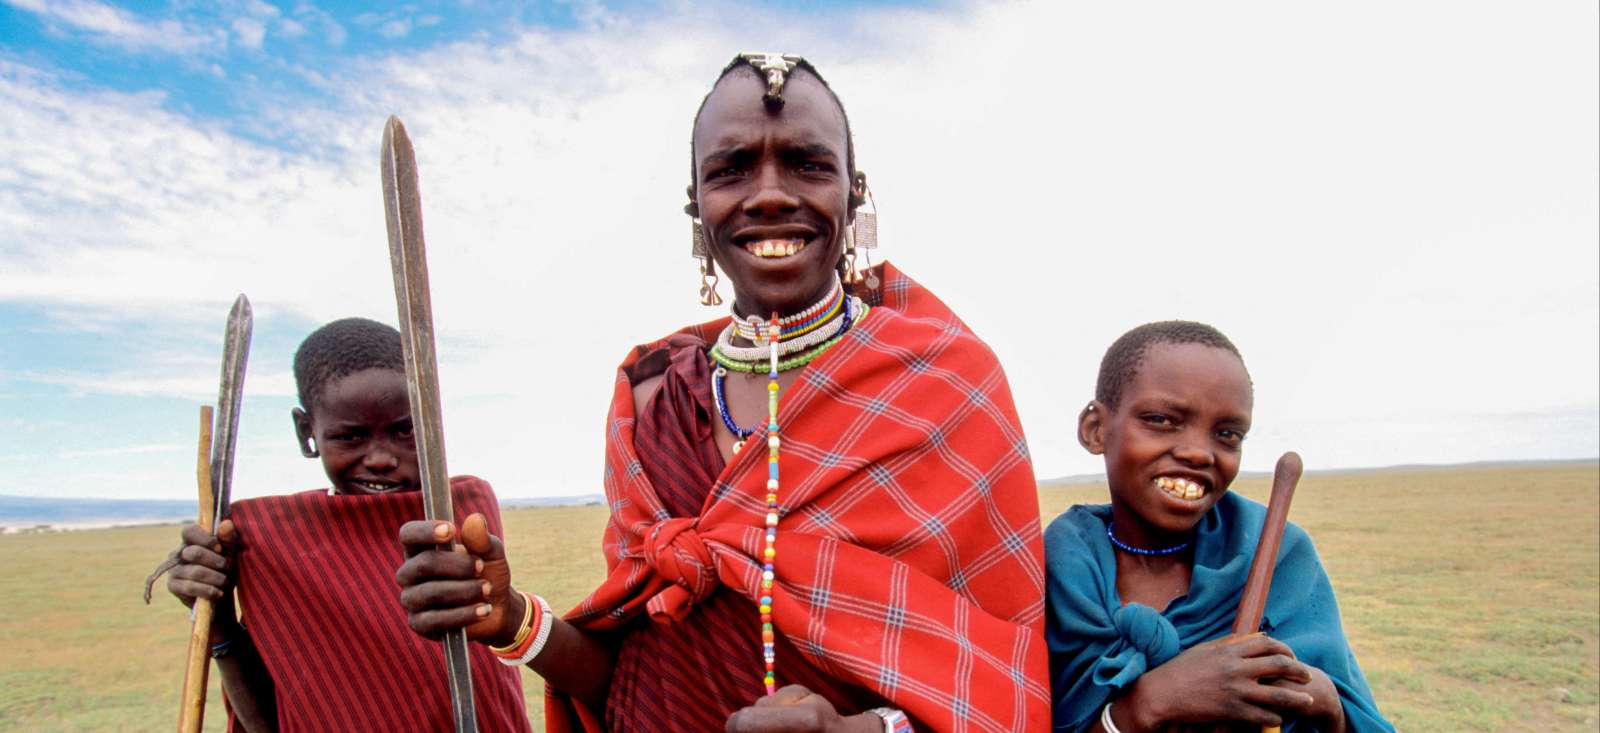 Voyage sur l'eau : Ma petite tribu en pays masai !